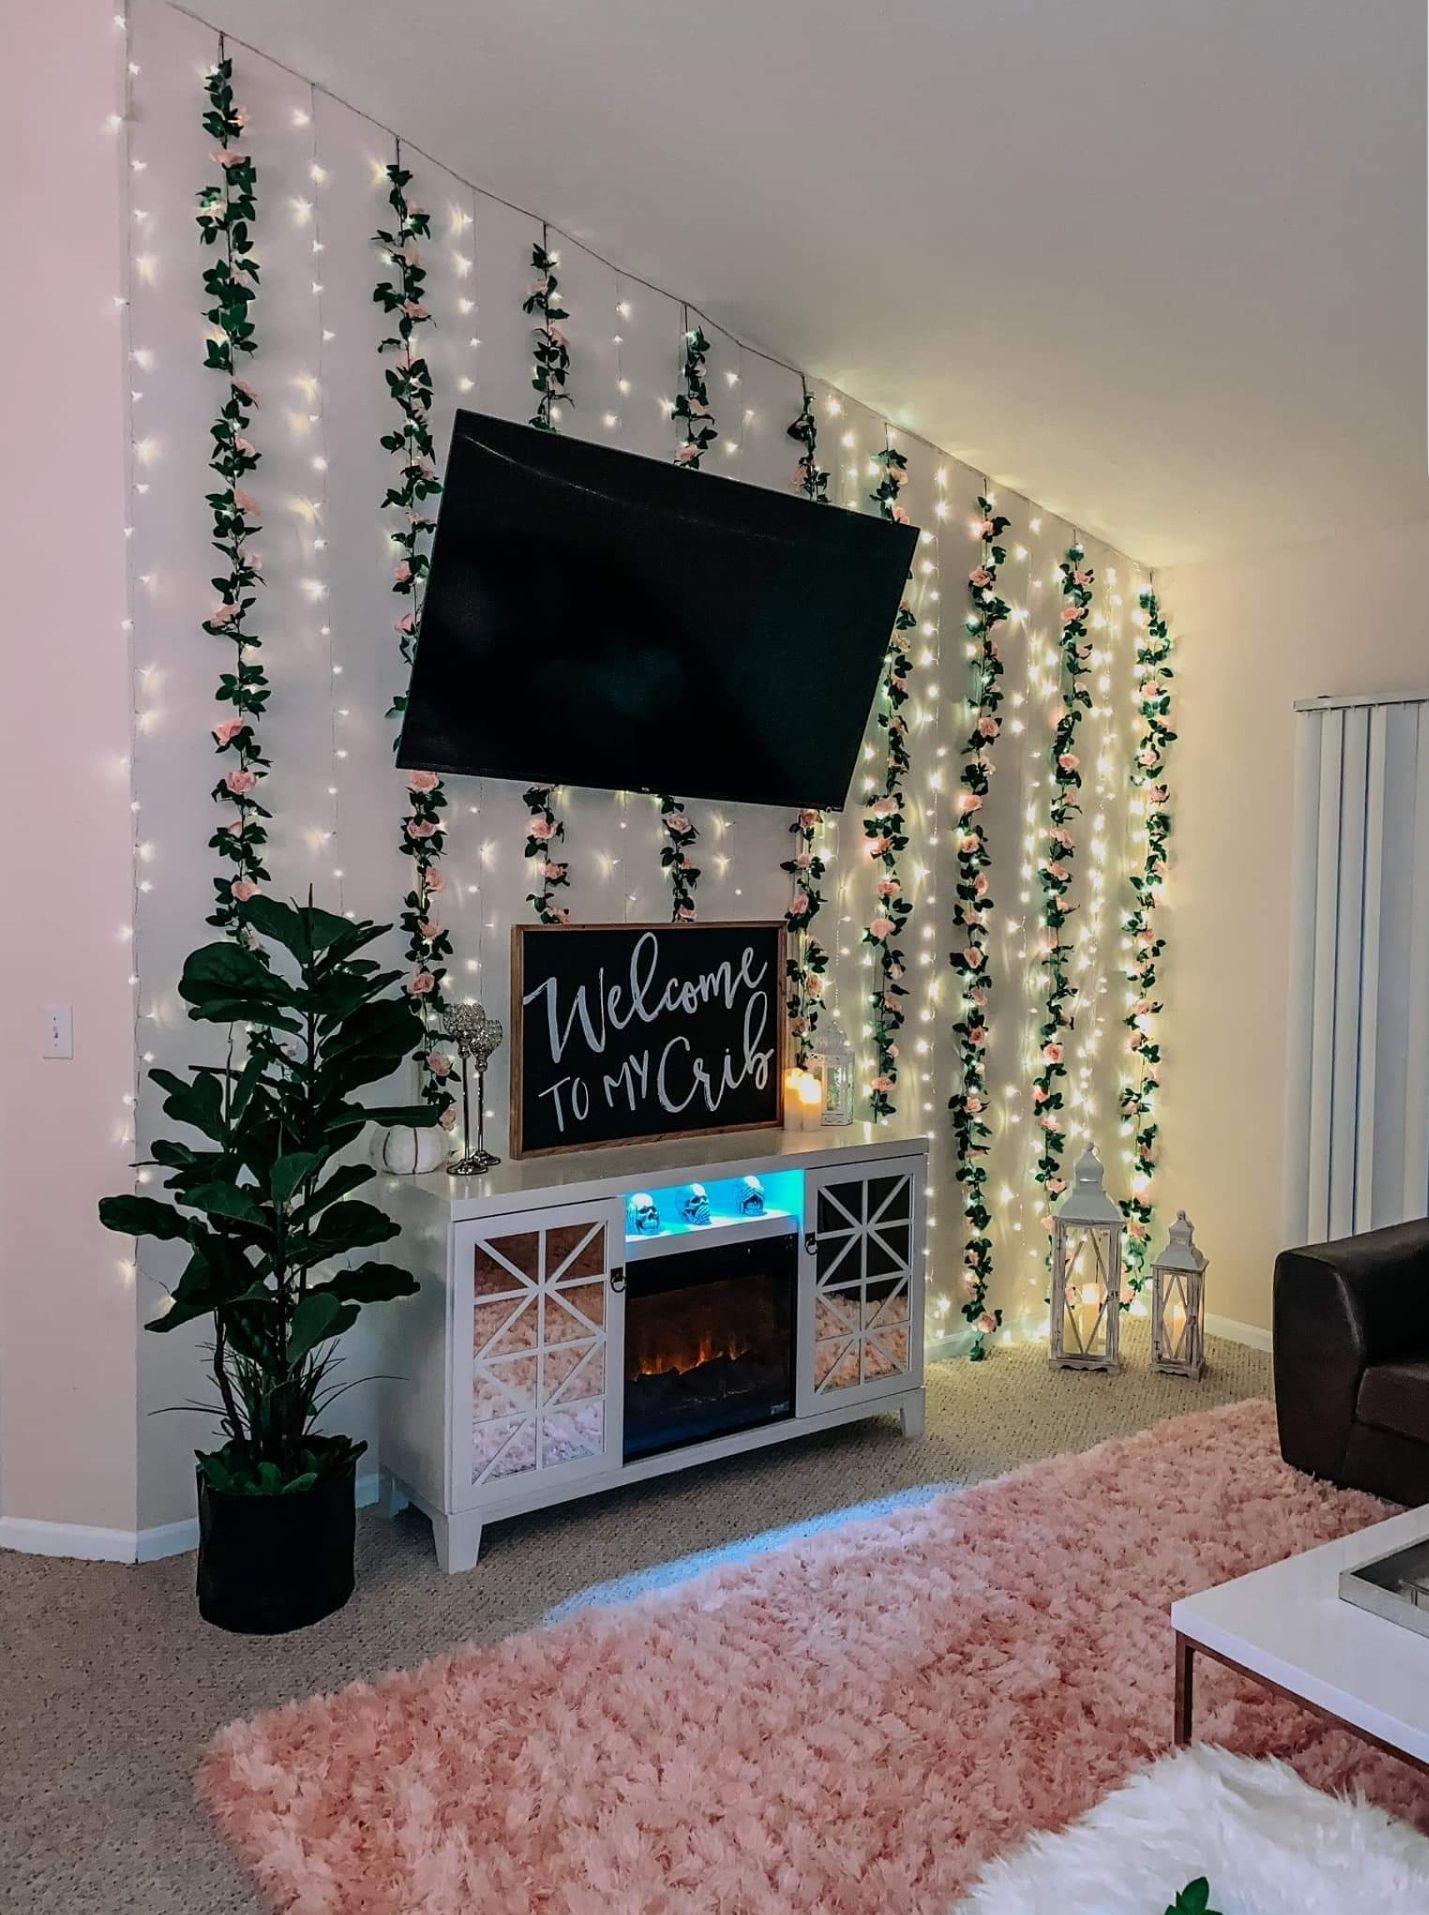 room ideas in 2020 | Living room decor apartment, Girl ...